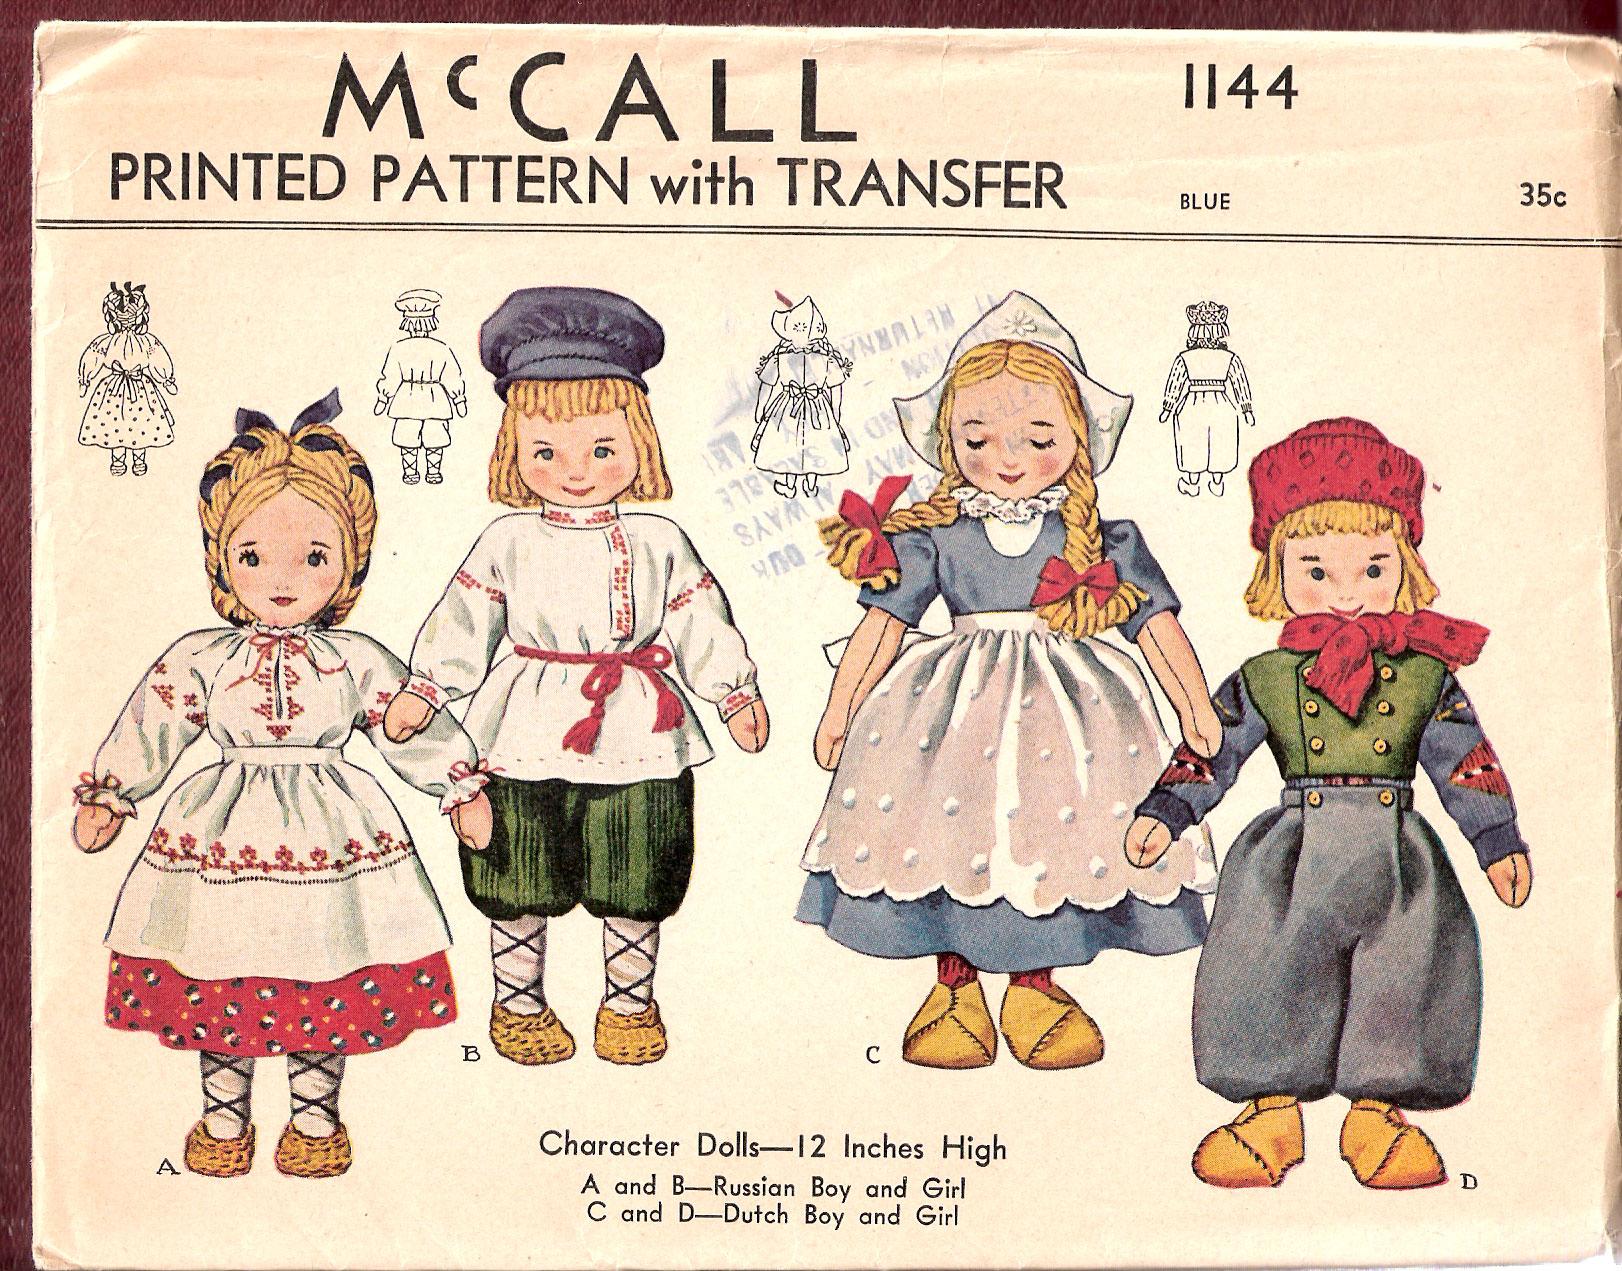 McCall 1144